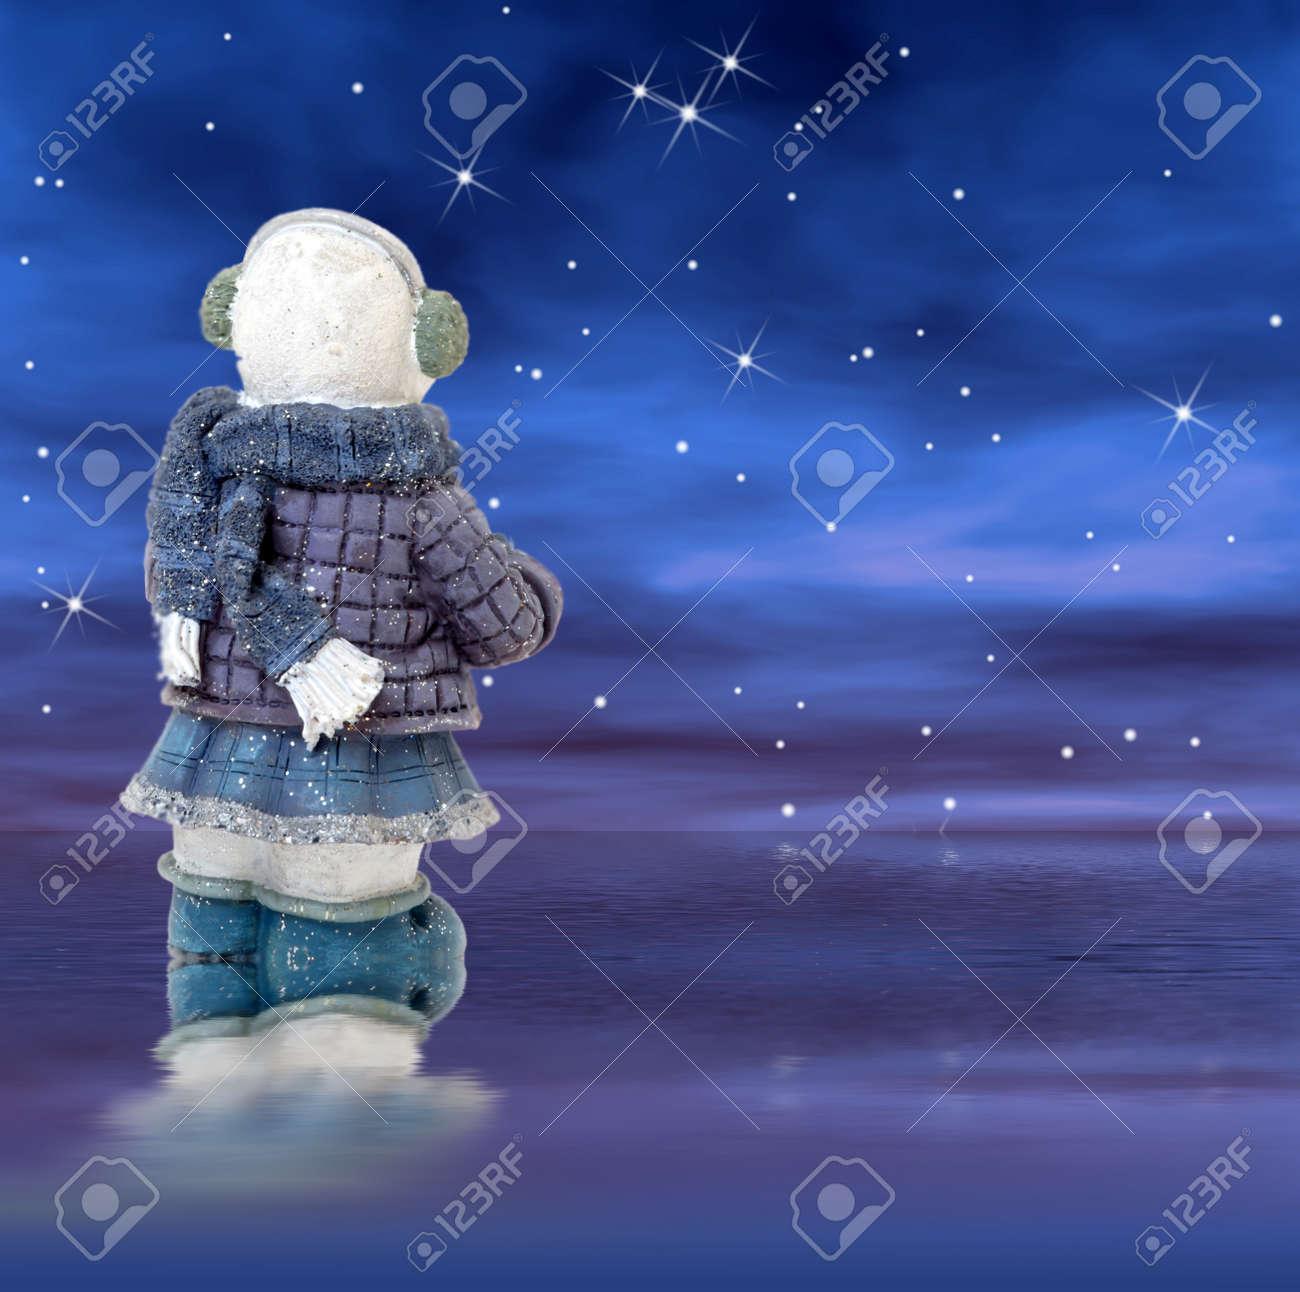 Snowman back facing the sky at night Stock Photo - 11688486